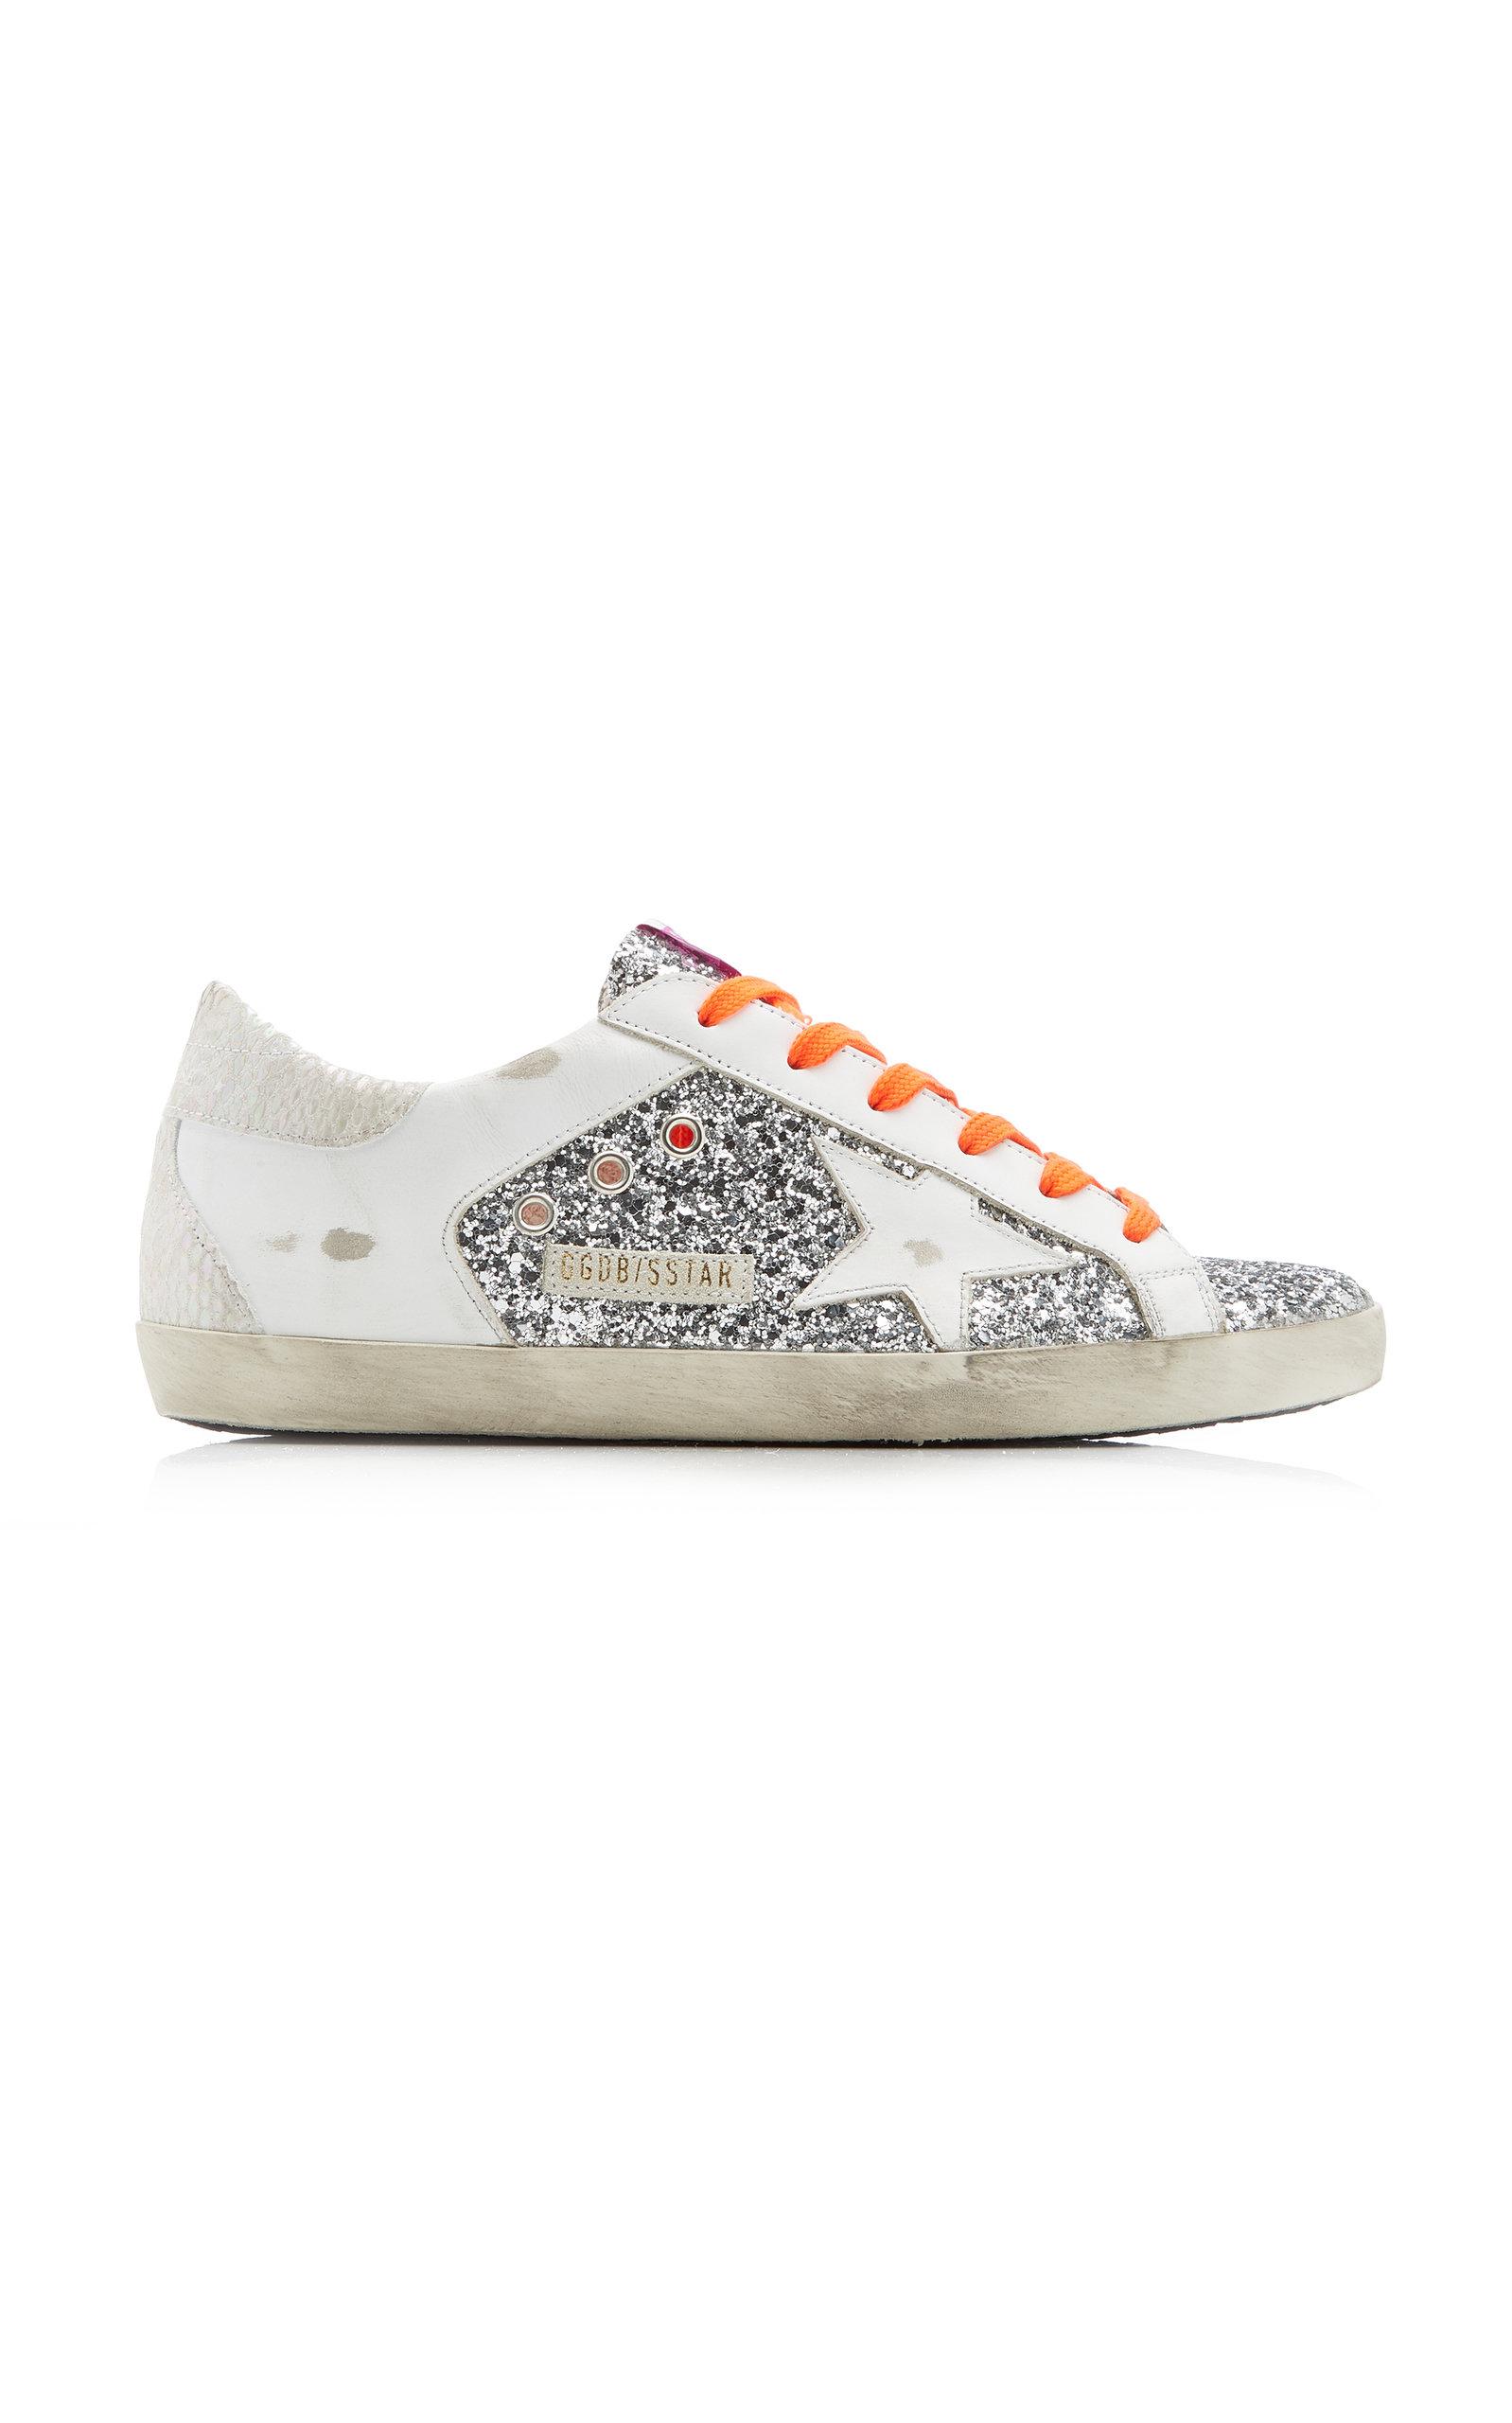 Golden Goose - Women's Super-Star Glittered Leather Sneakers - Silver - Moda Operandi